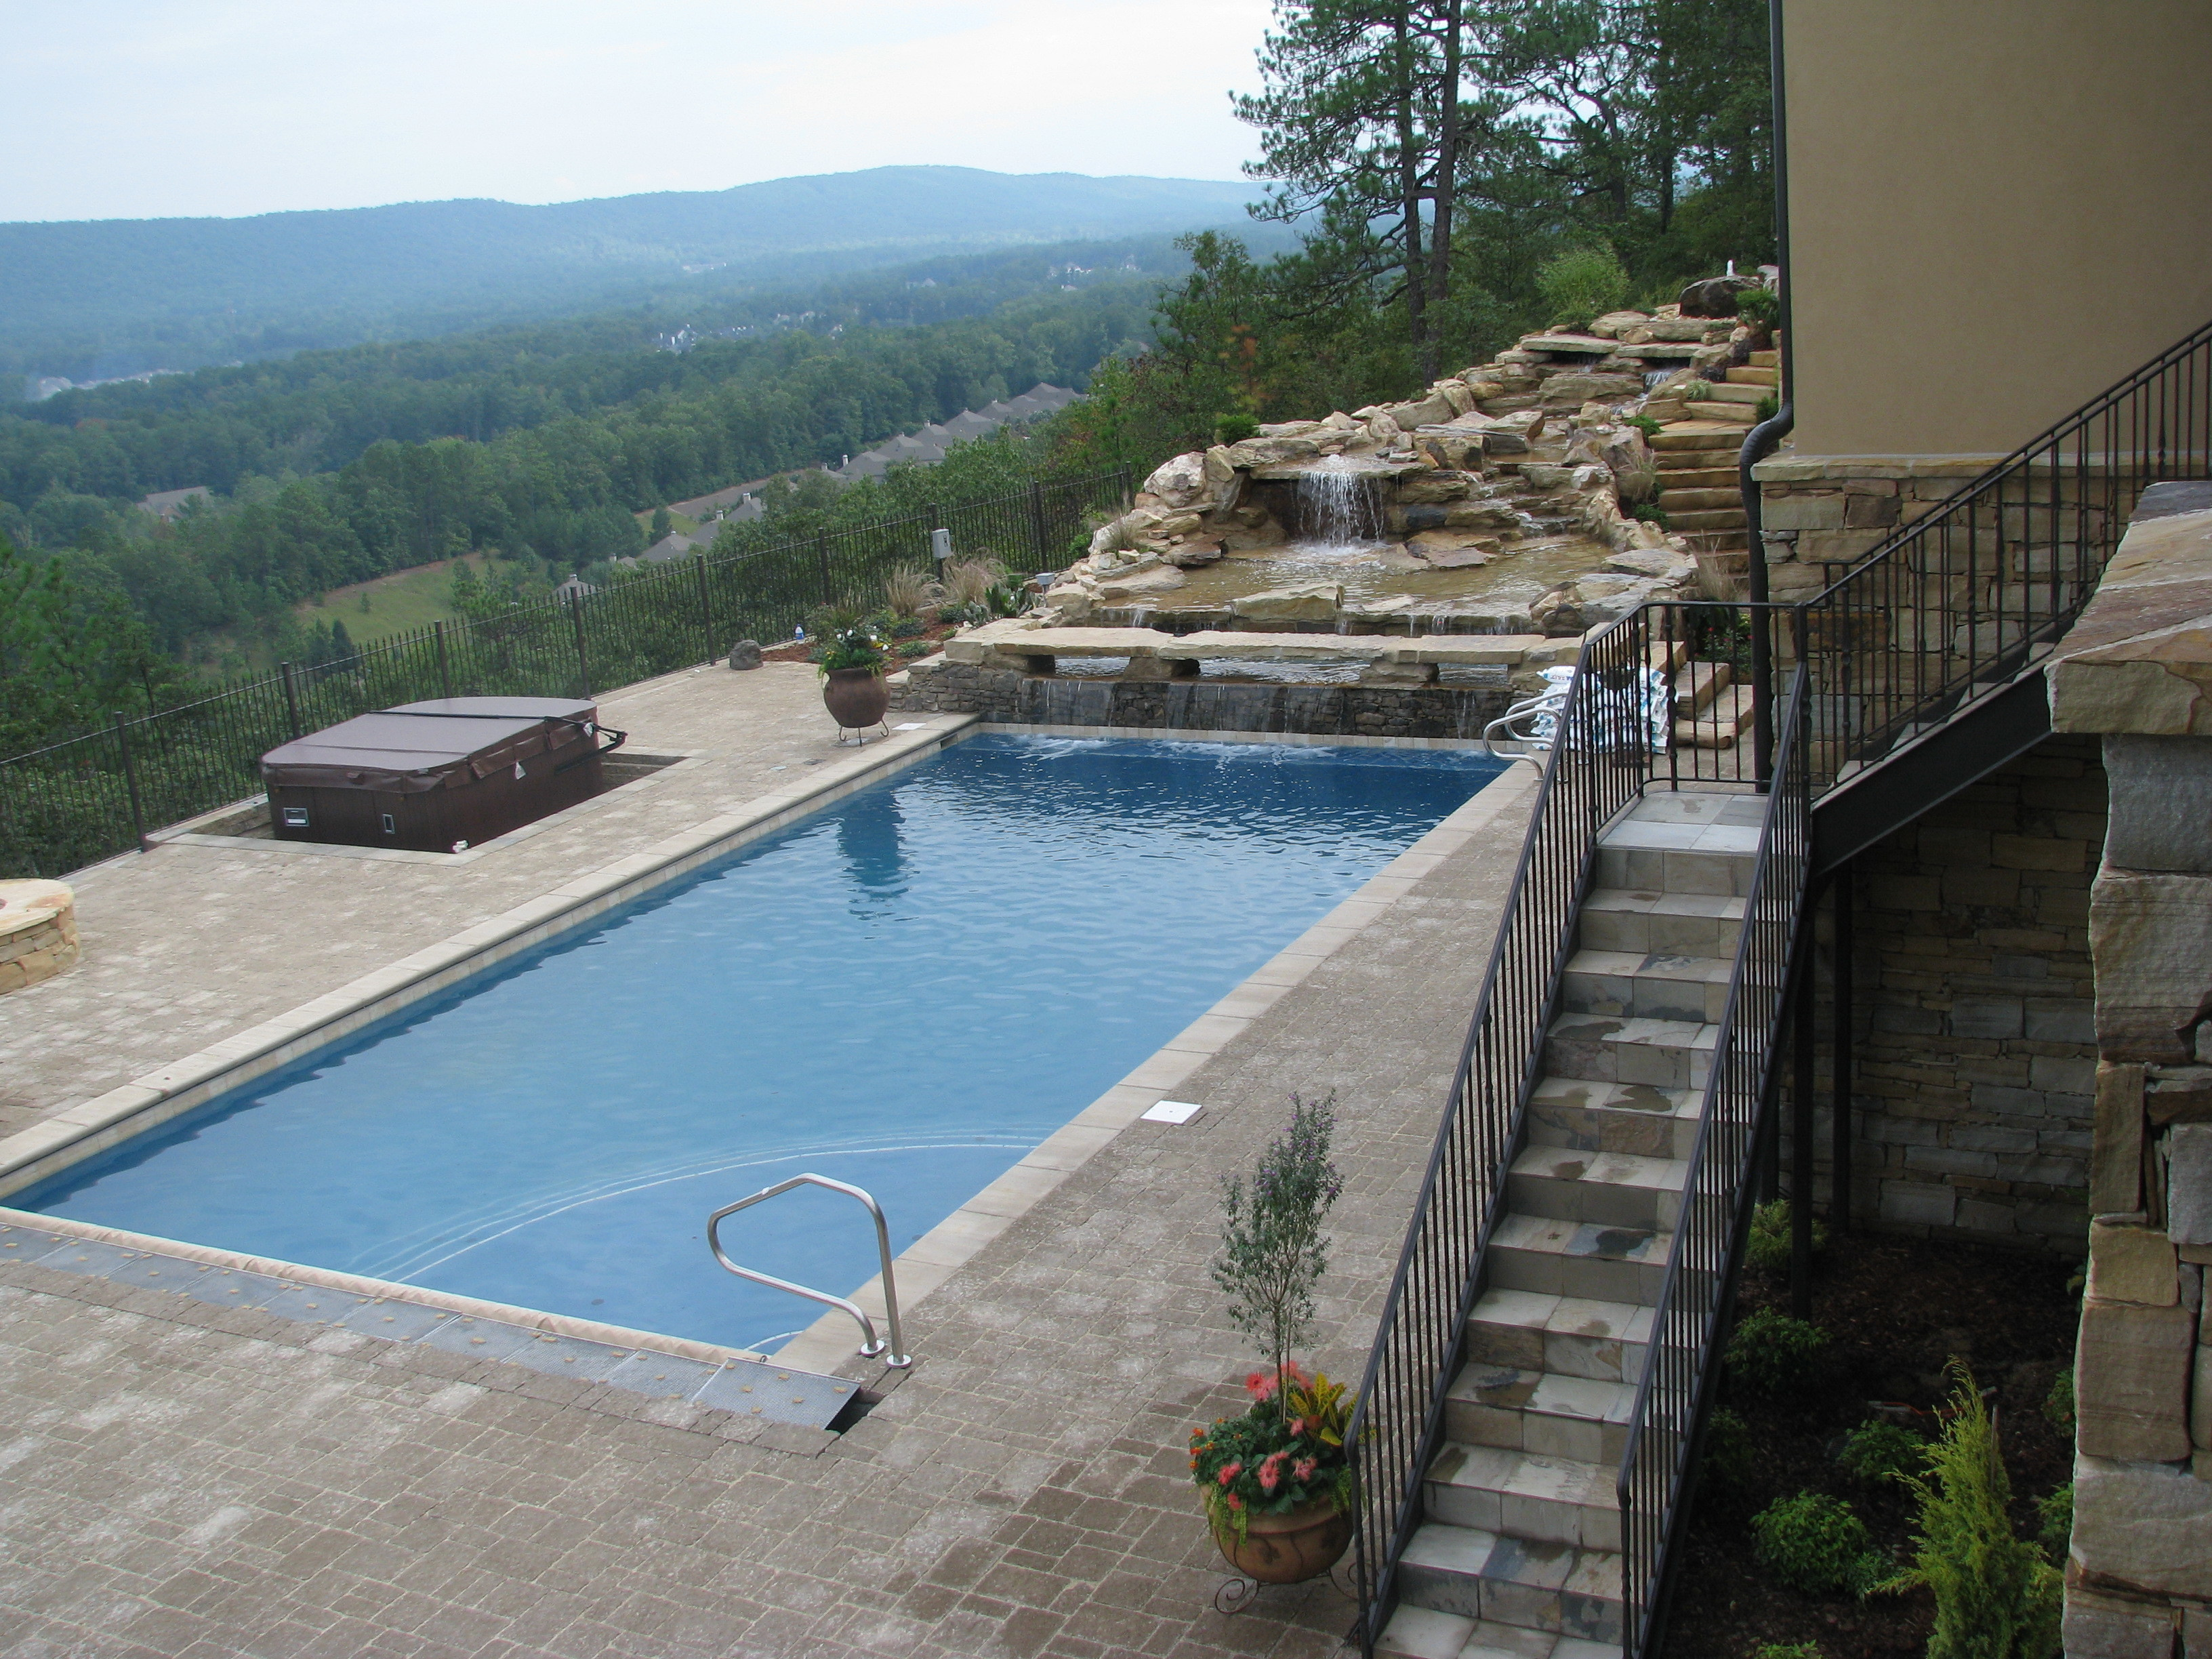 Mancha Hardscapes Pools  and  Spas image 2